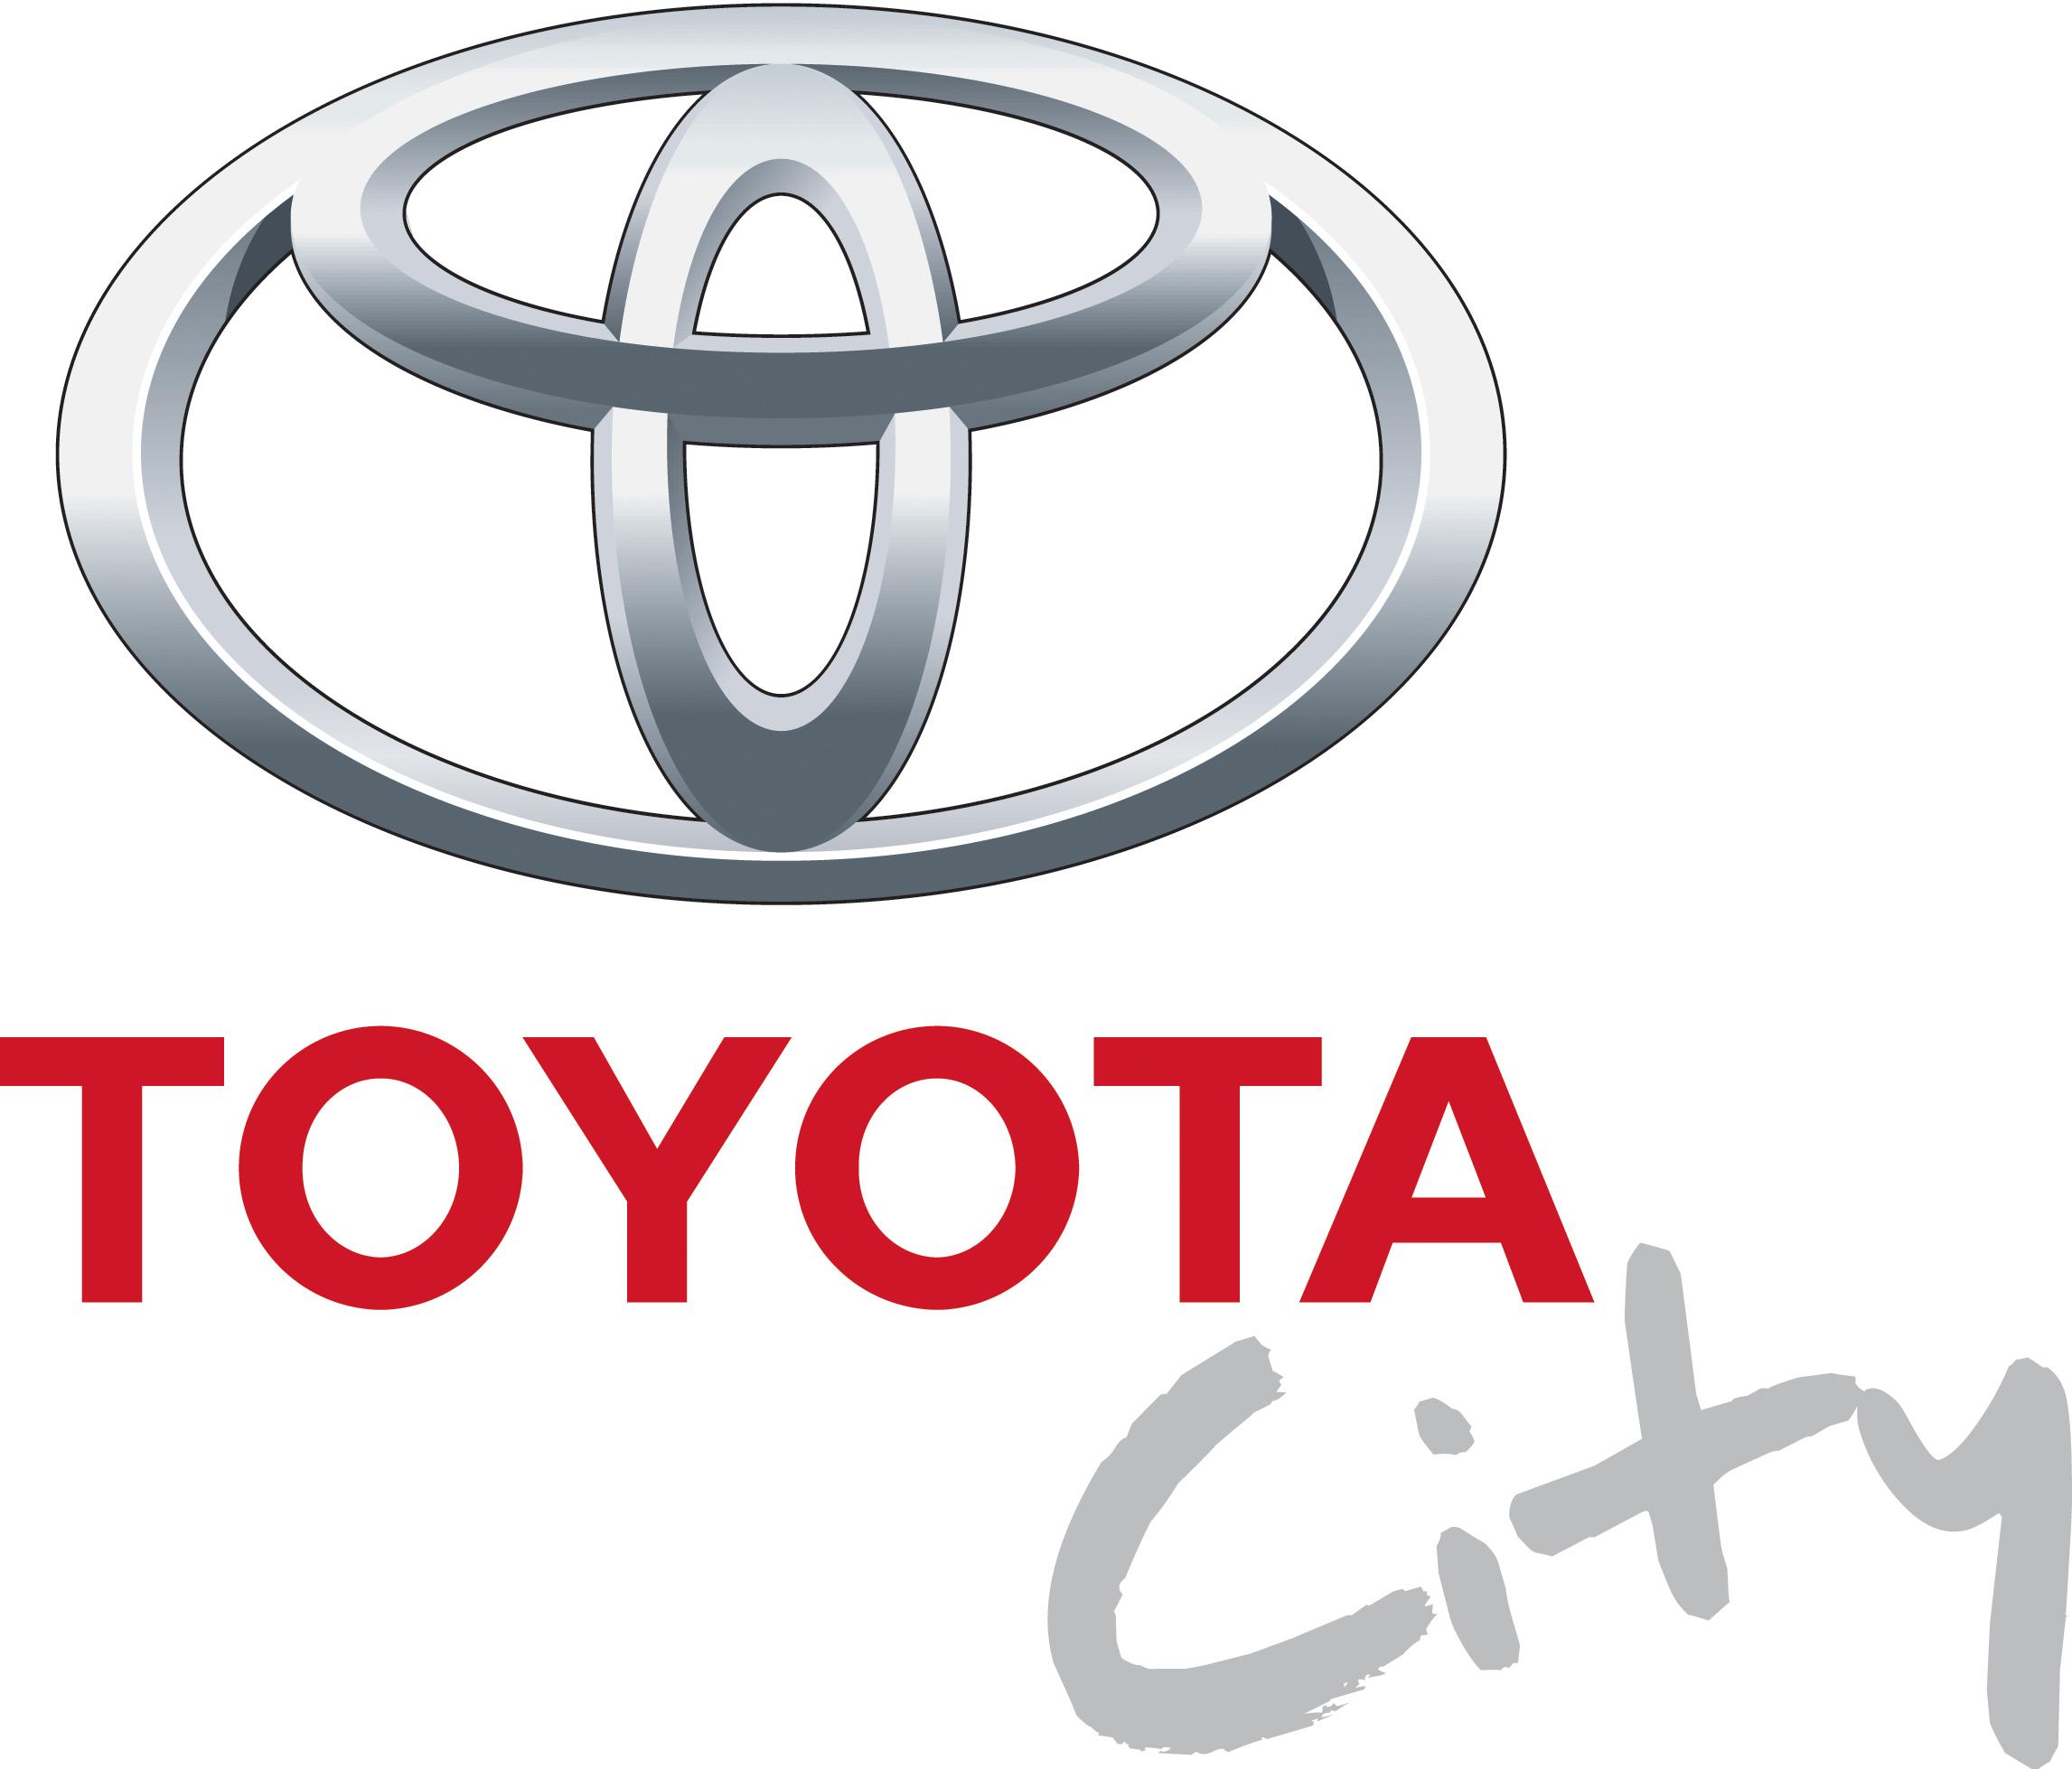 Toyota Supra For Sale In Pa: Toyota City Zaventem The Amazing Toyota